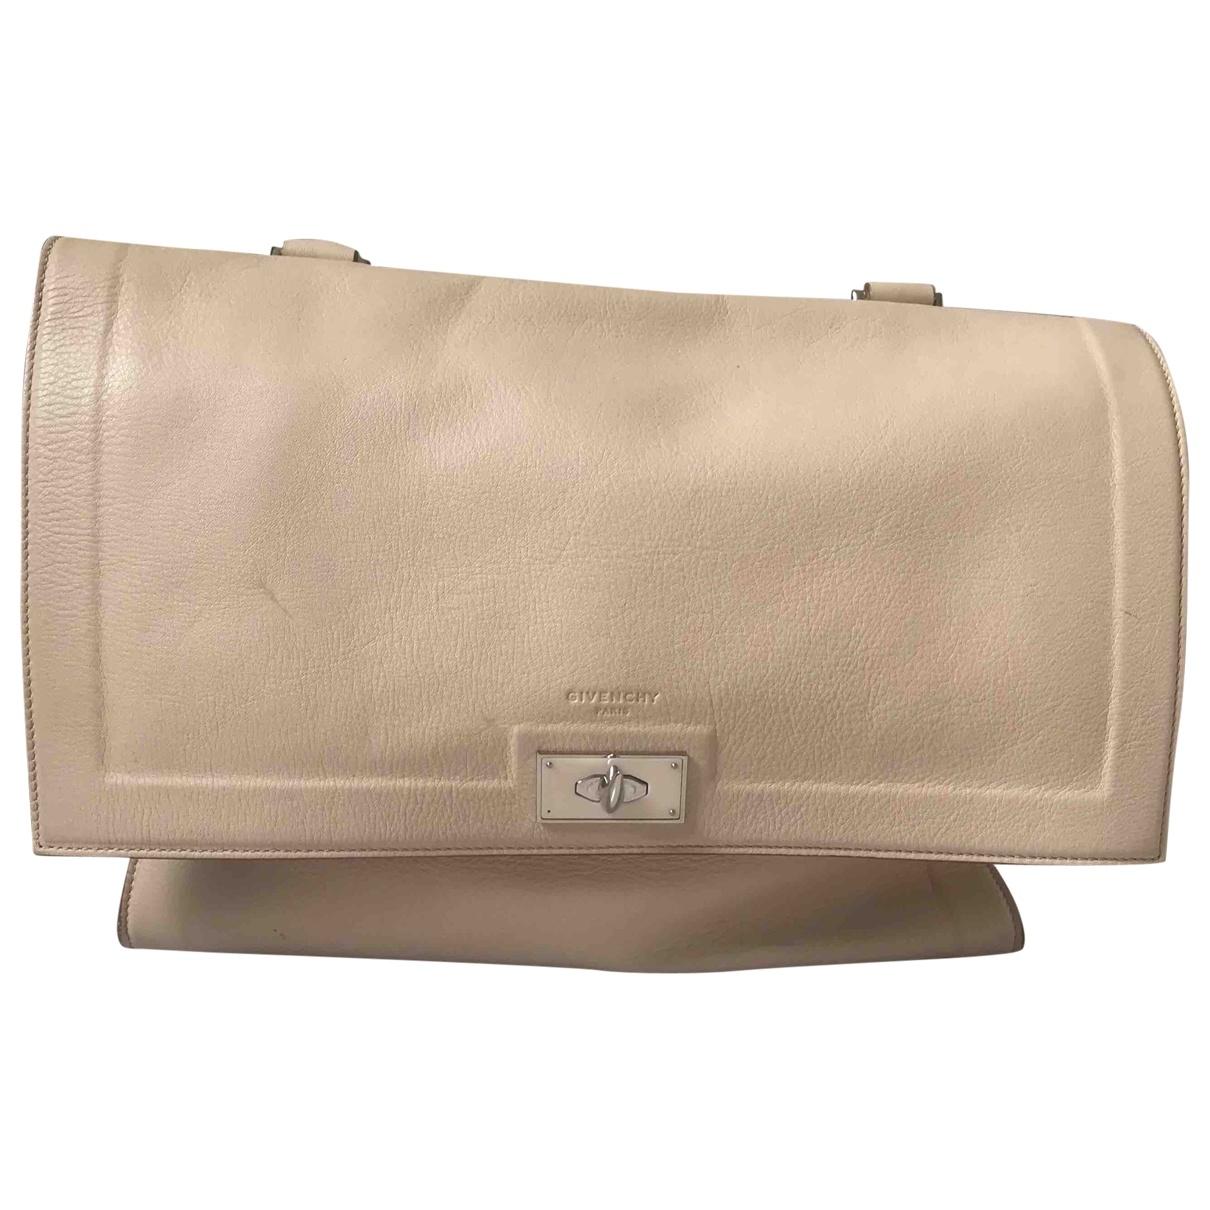 Givenchy Shark Beige Leather handbag for Women \N